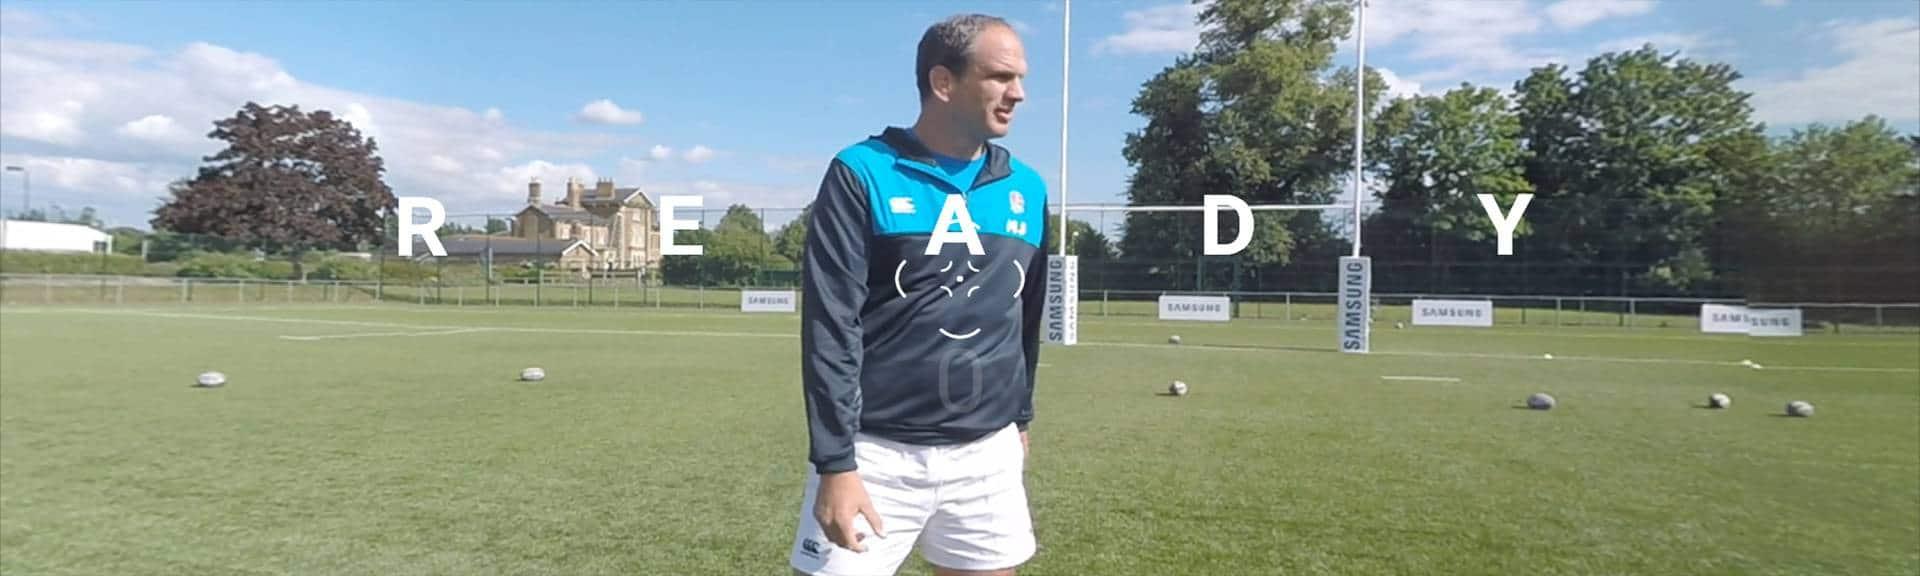 samsung school of rugby 2